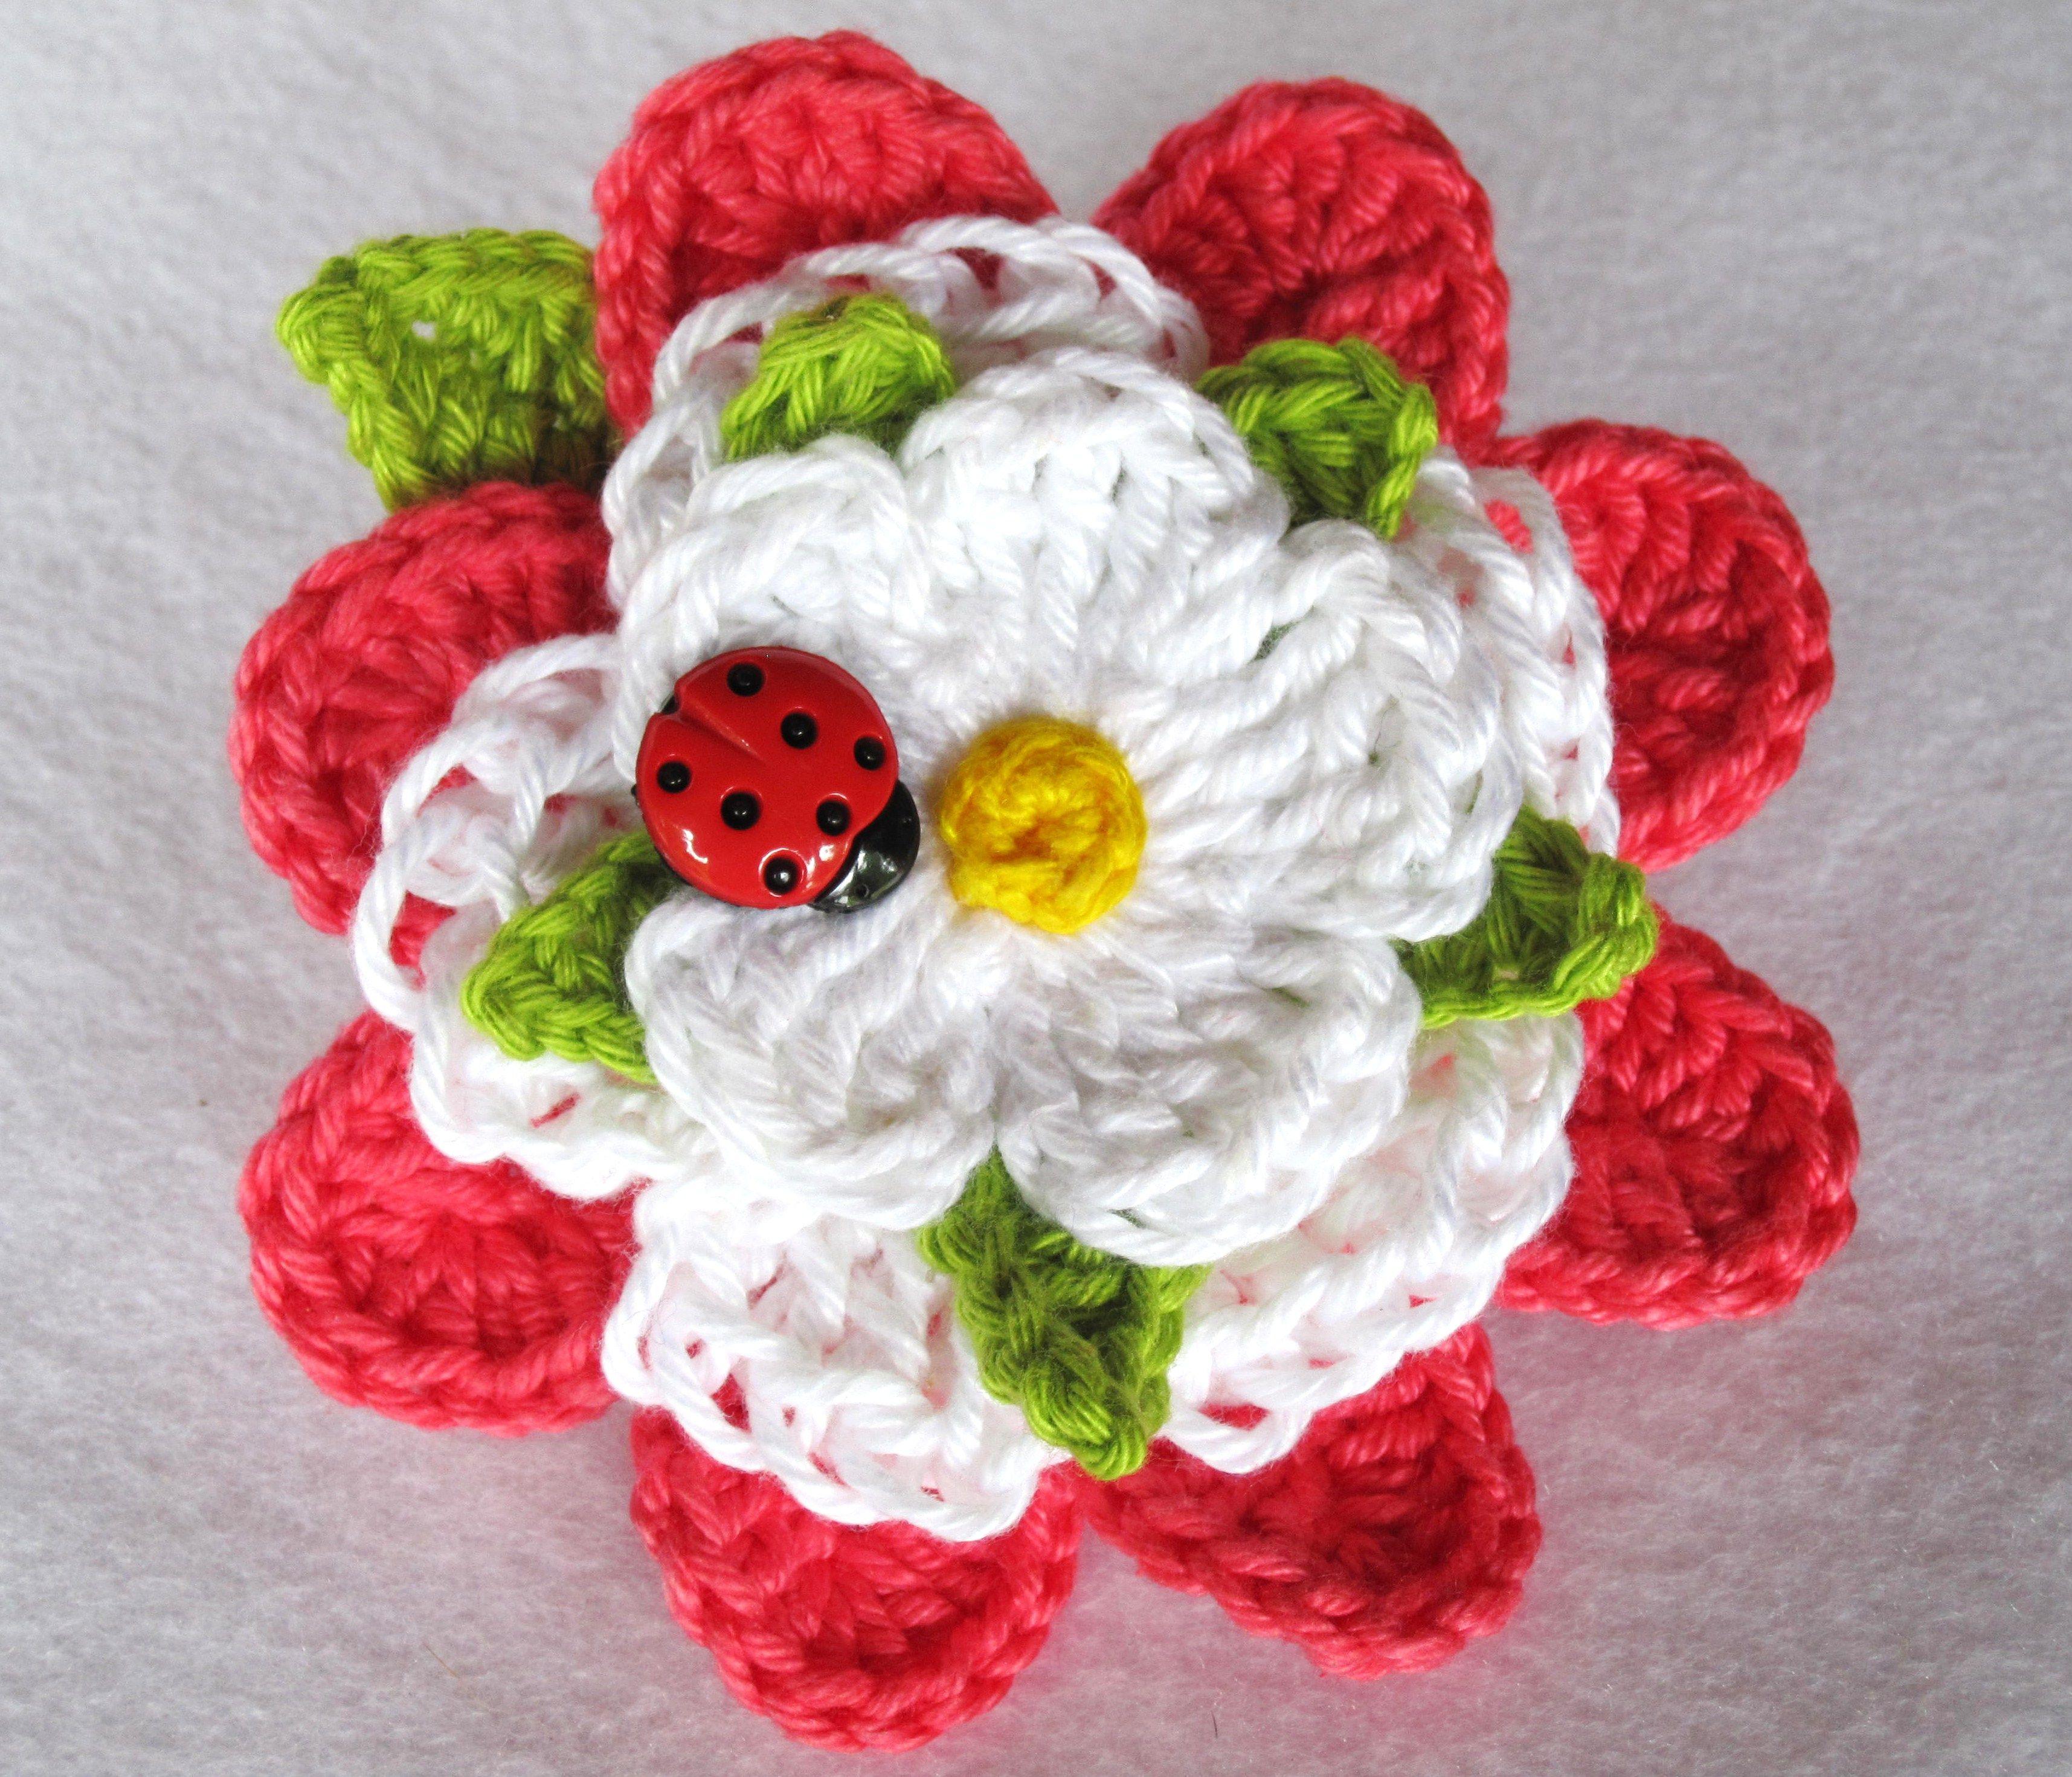 Crochet Love this! | FLOWERS | Pinterest | Haken, Häckeln und Häkeln